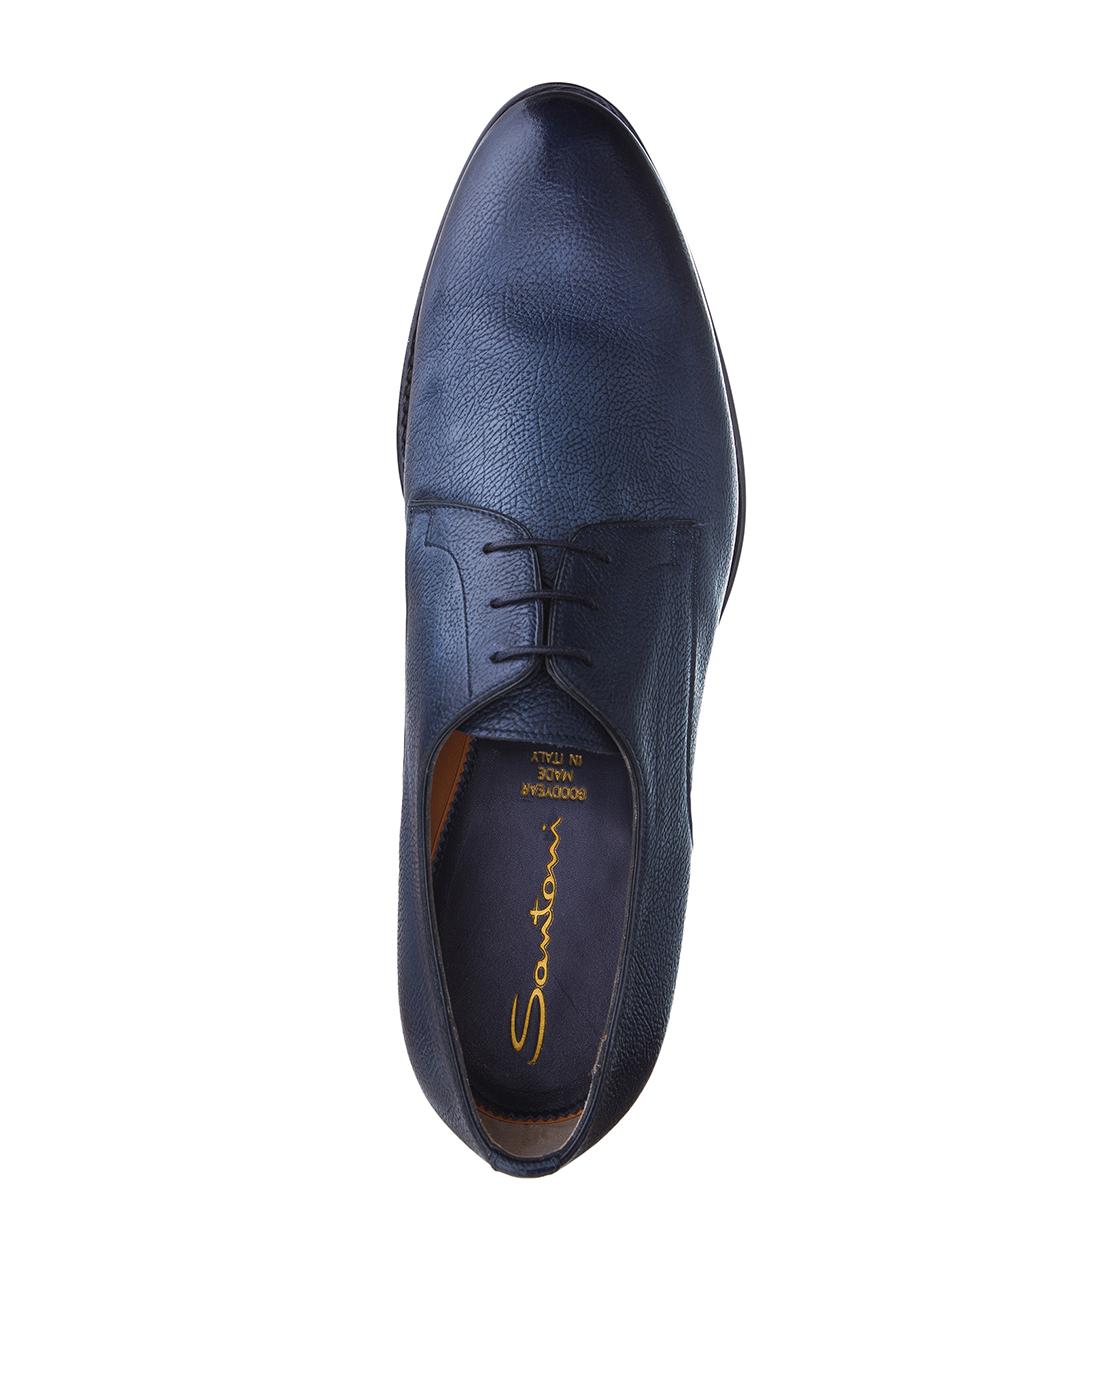 Туфли синие мужские Santoni S14303-5